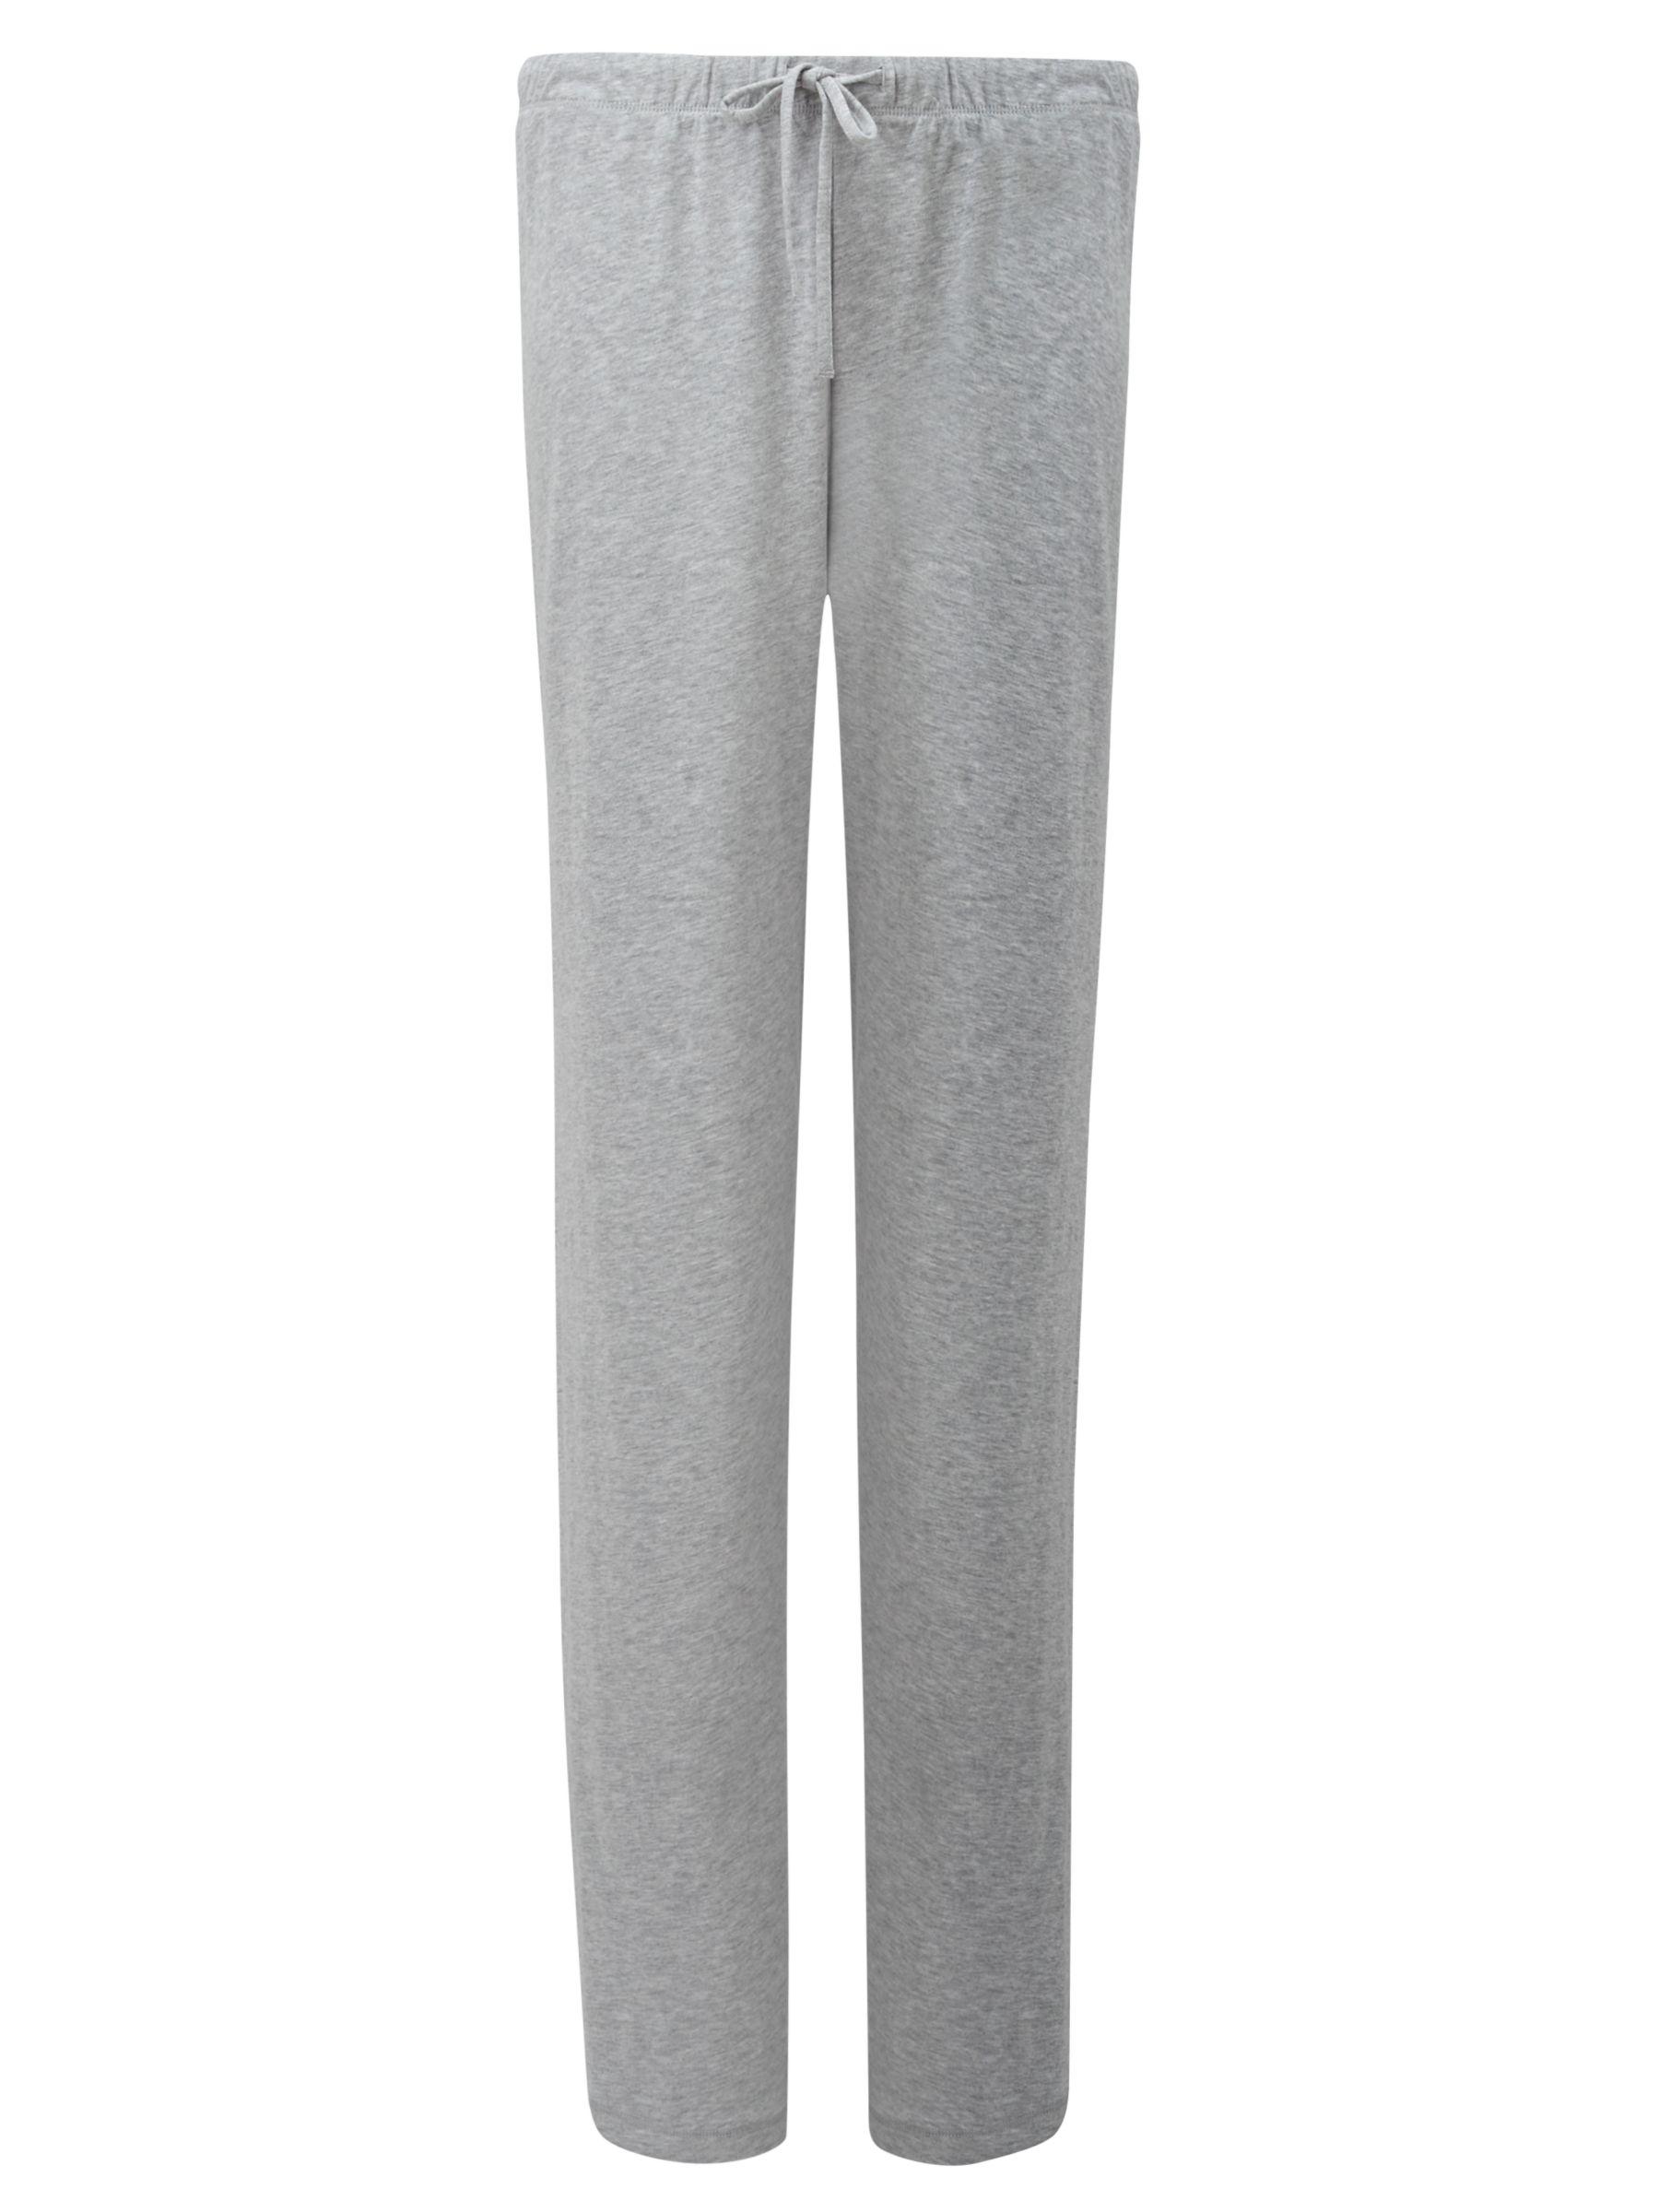 John Lewis Long Pyjama Bottoms, Grey